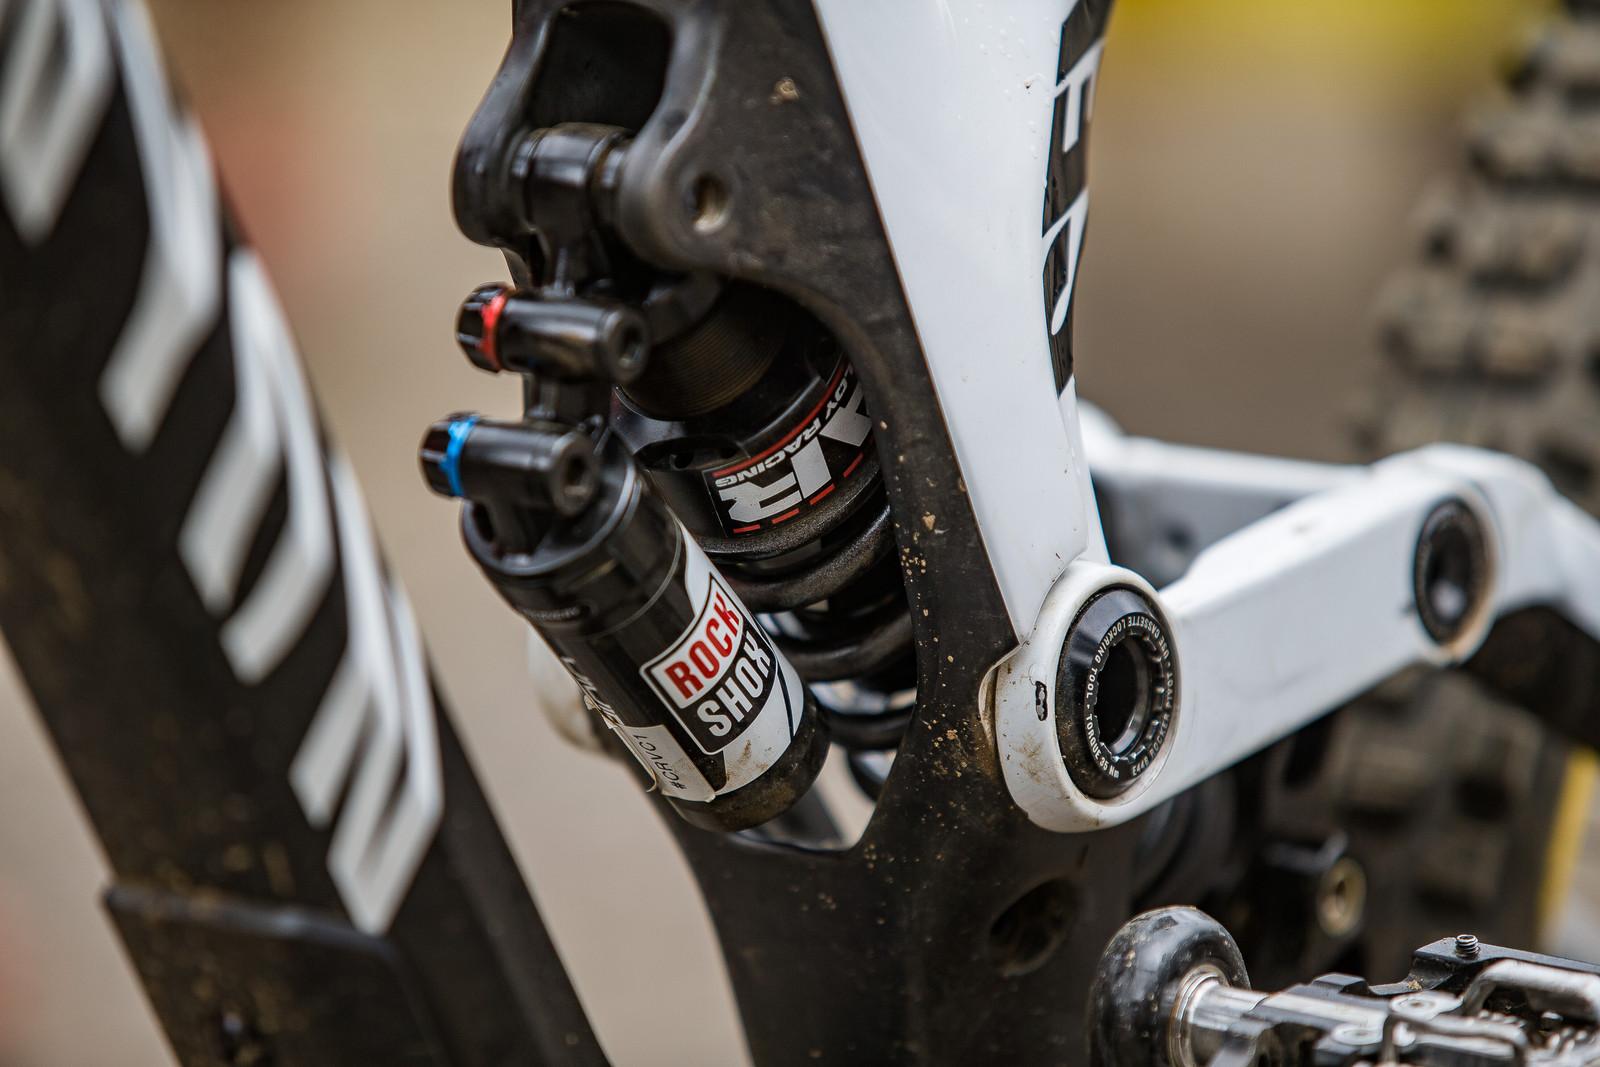 RockShox Vivid Coil with Super Alloy Racing Spring - WINNING BIKE: Troy Brosnan's Canyon Sender - Mountain Biking Pictures - Vital MTB